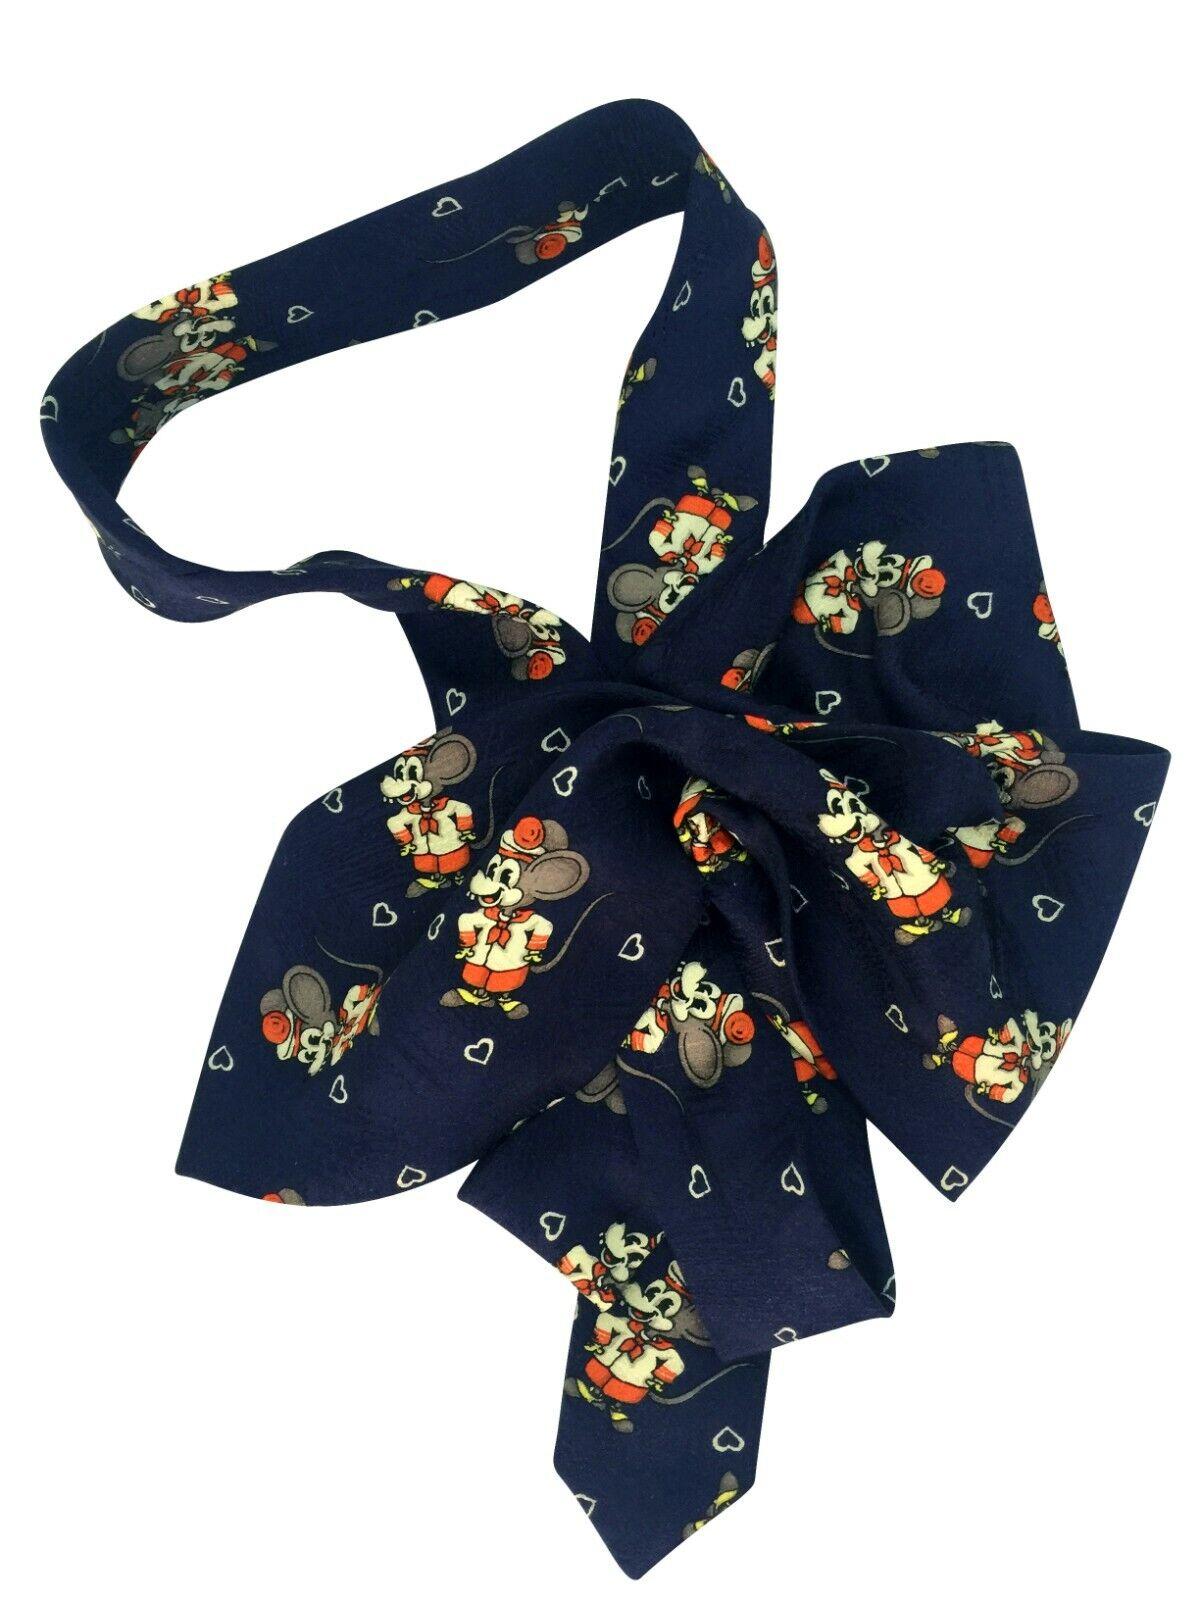 Tie women's Silk 100% Italy. Collar necklace necktie cravat Hand-made